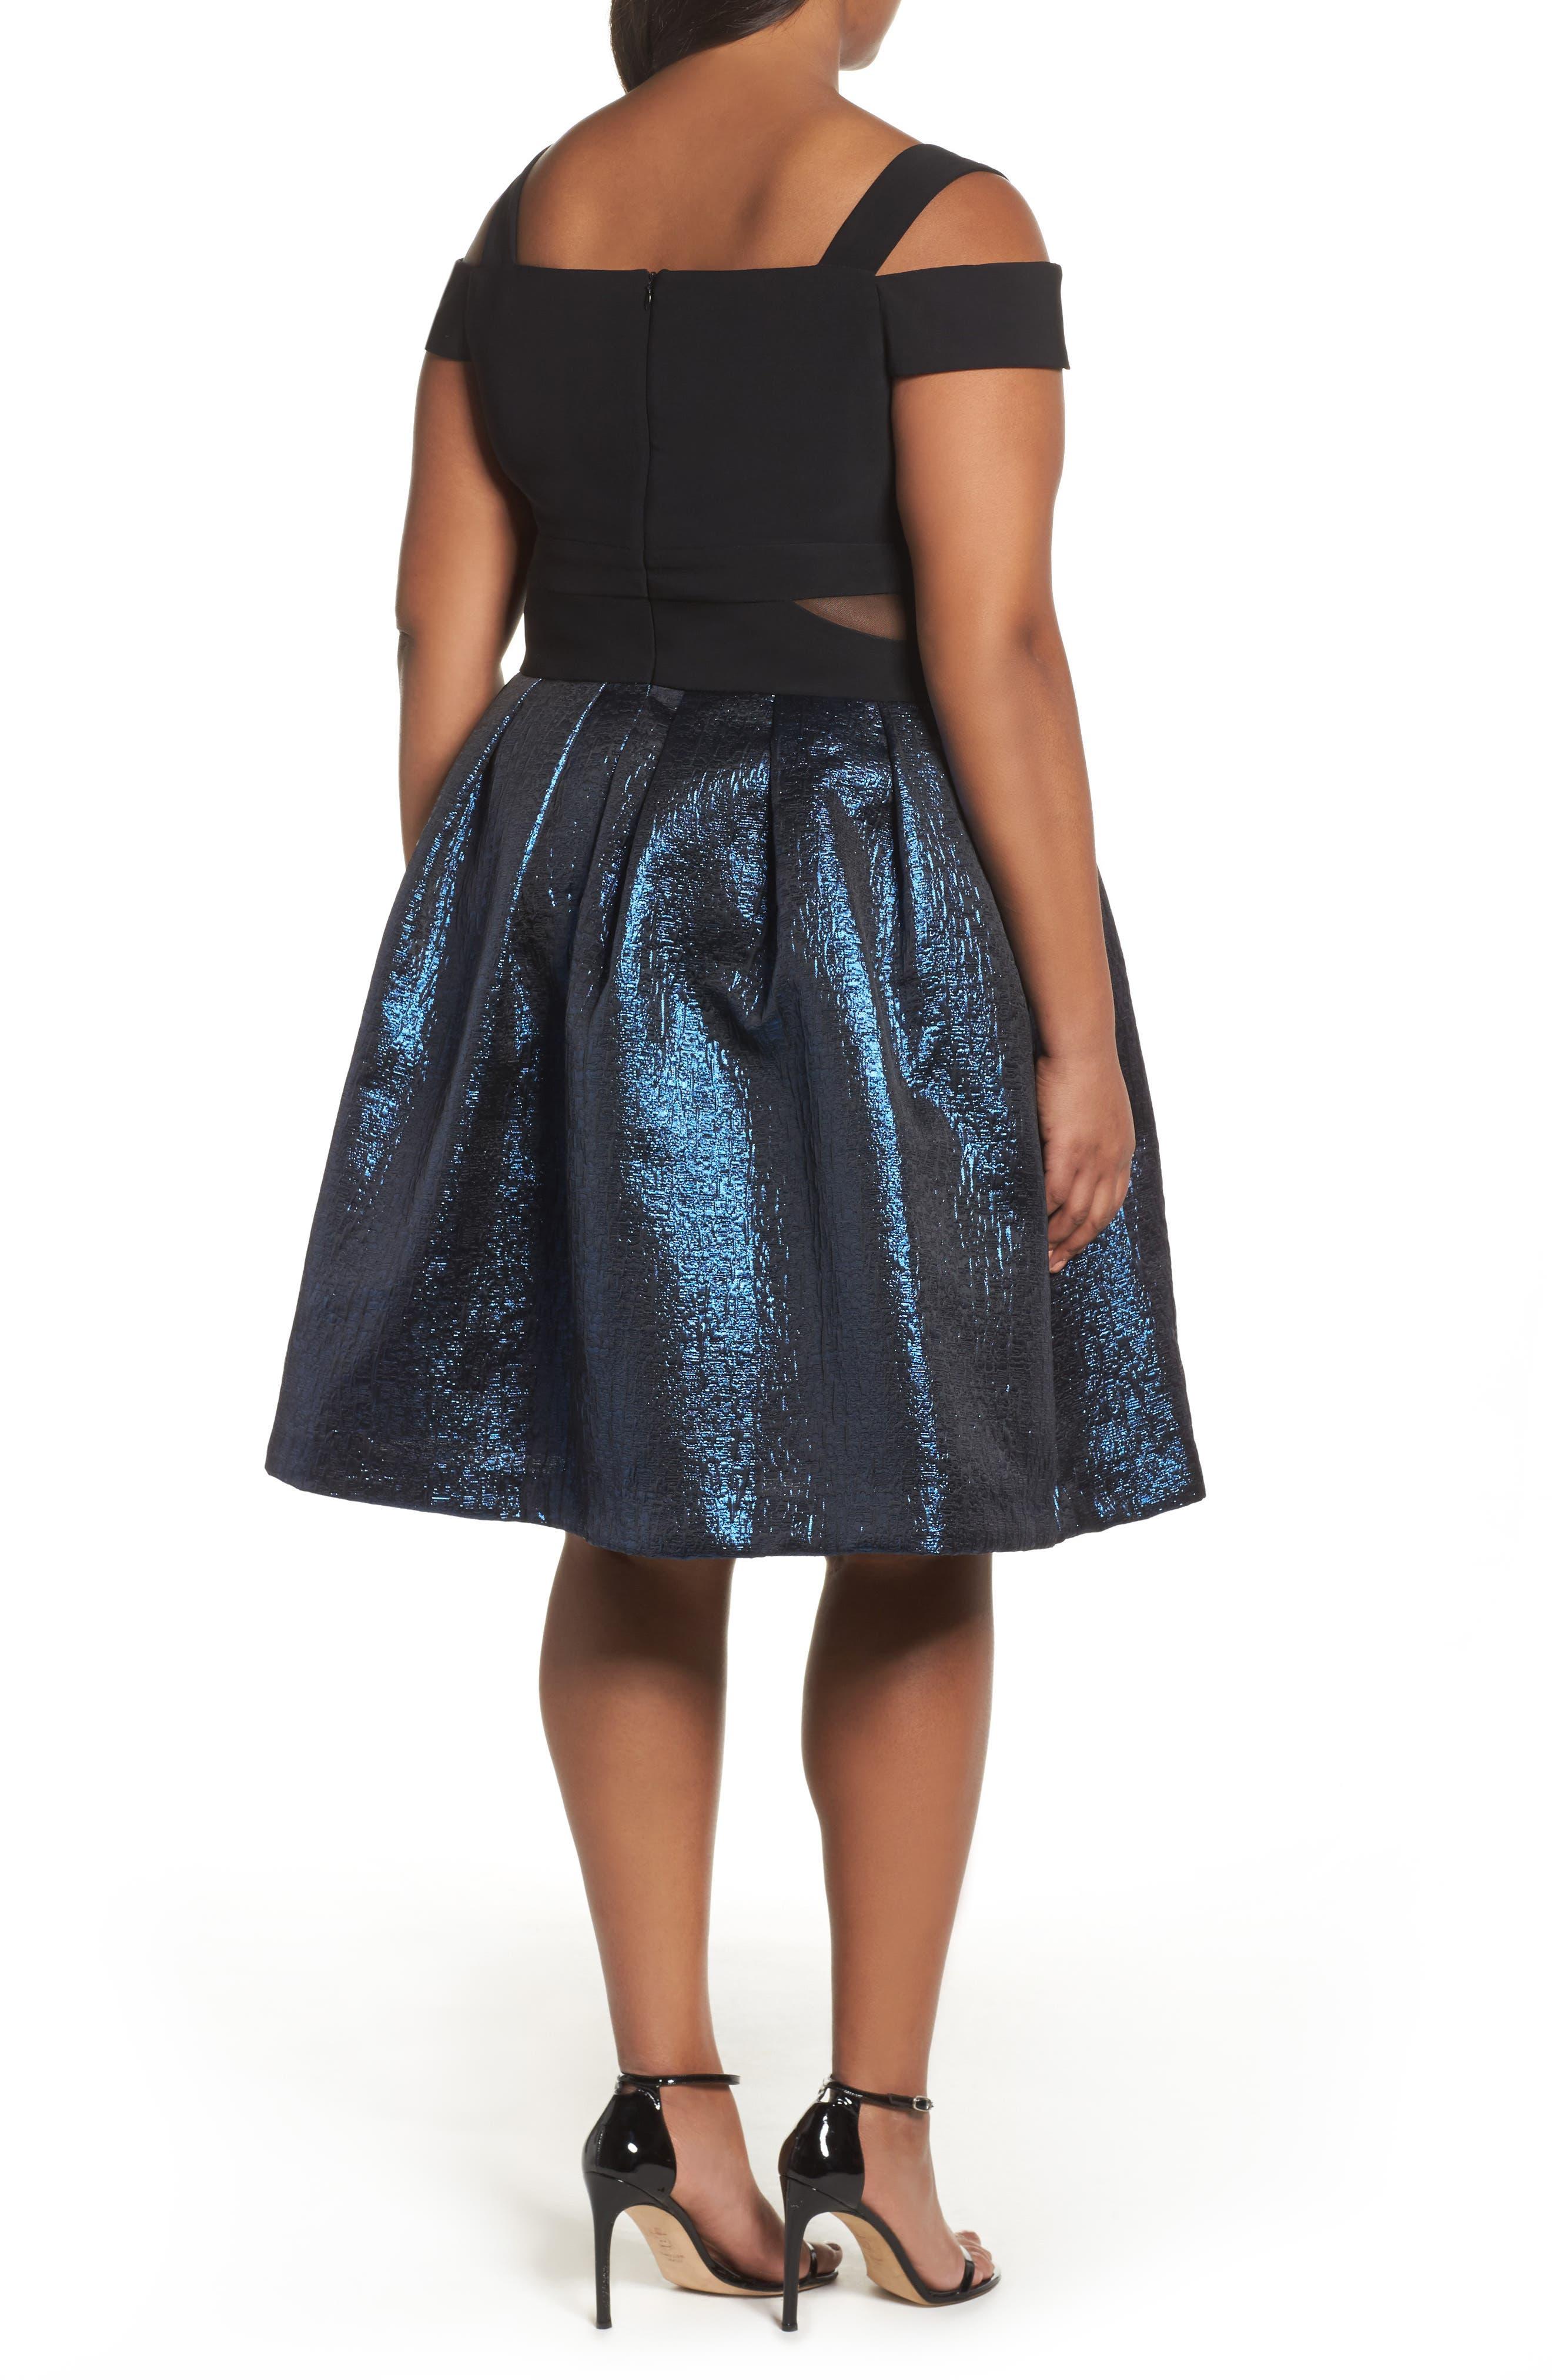 Cold Shoulder Mixed Media Party Dress,                             Alternate thumbnail 2, color,                             Black/ Blue